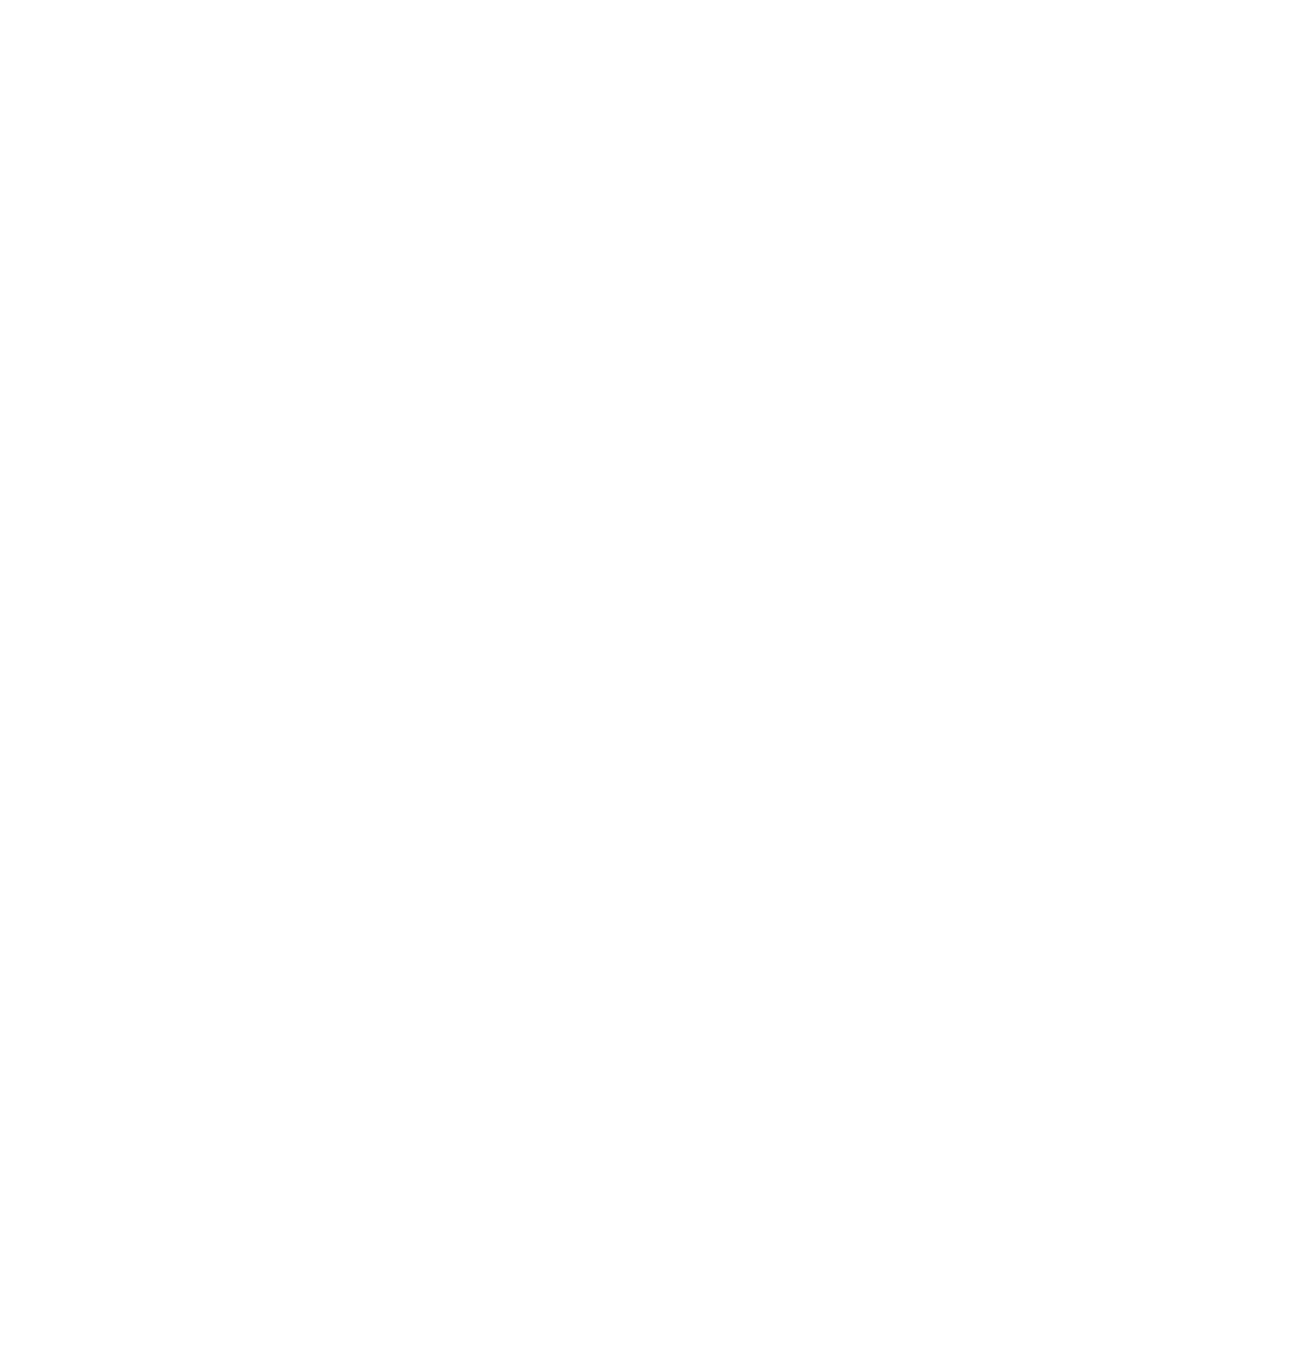 01_Windows logo